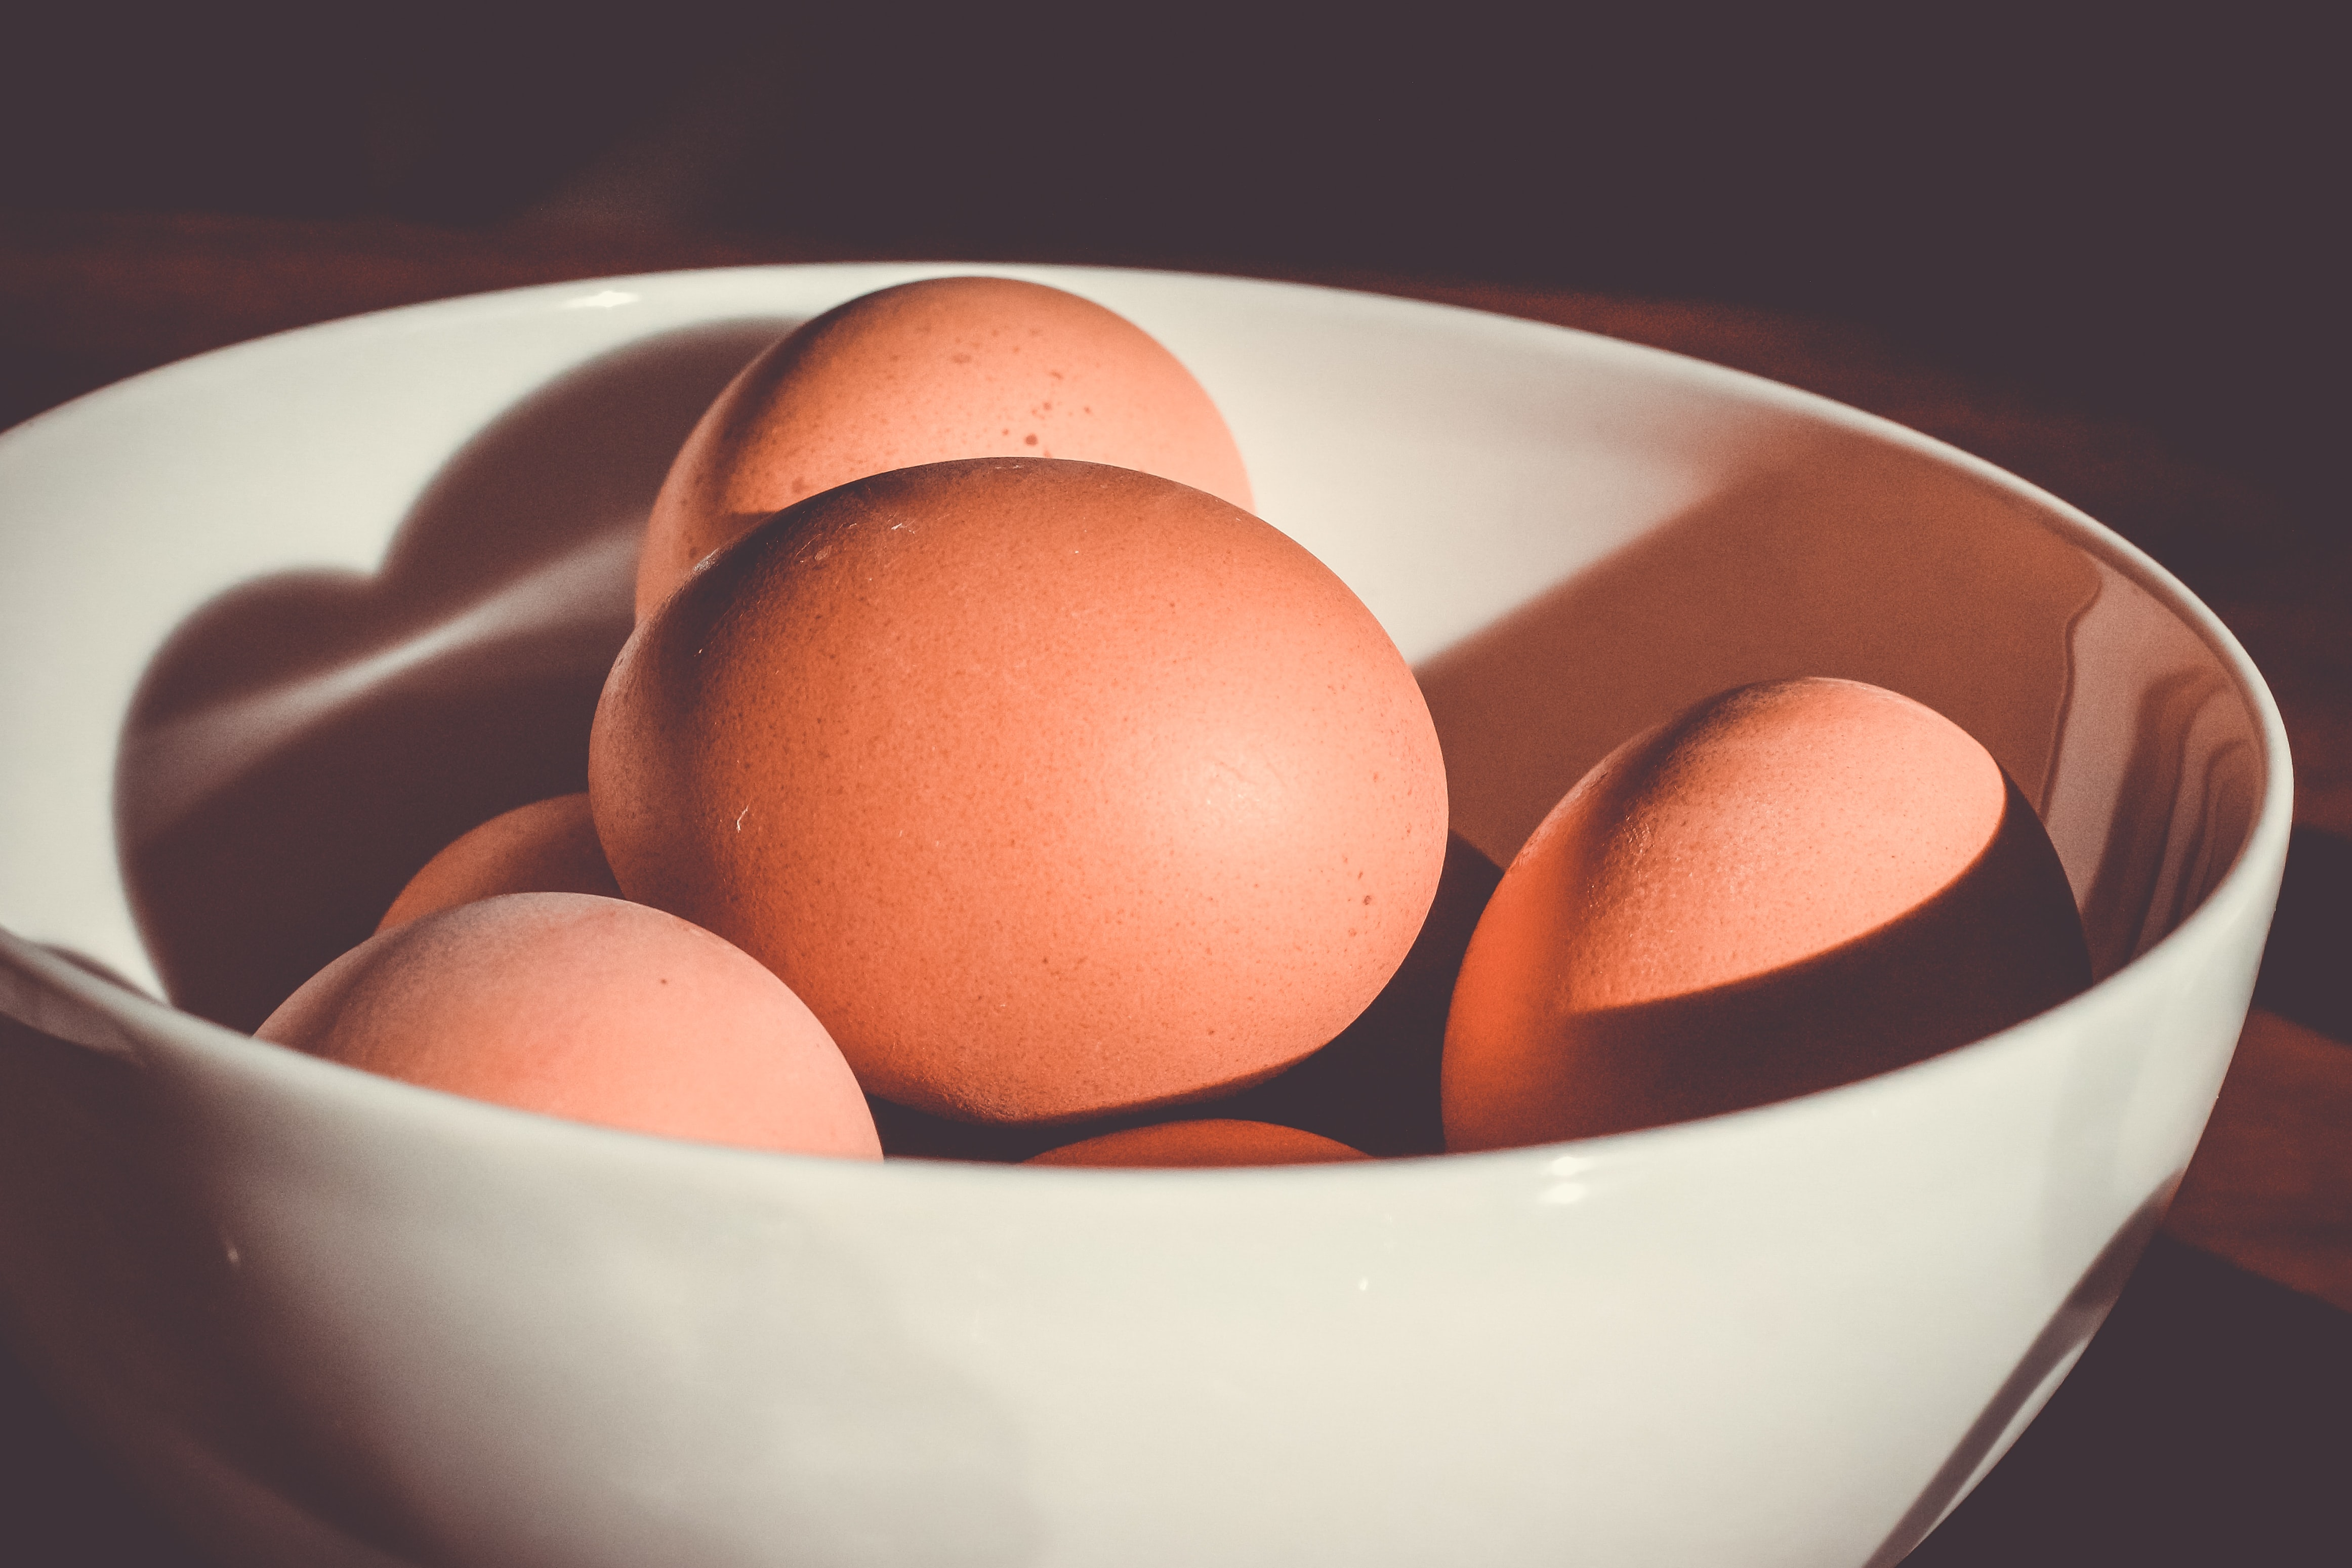 raw eggs on bowl